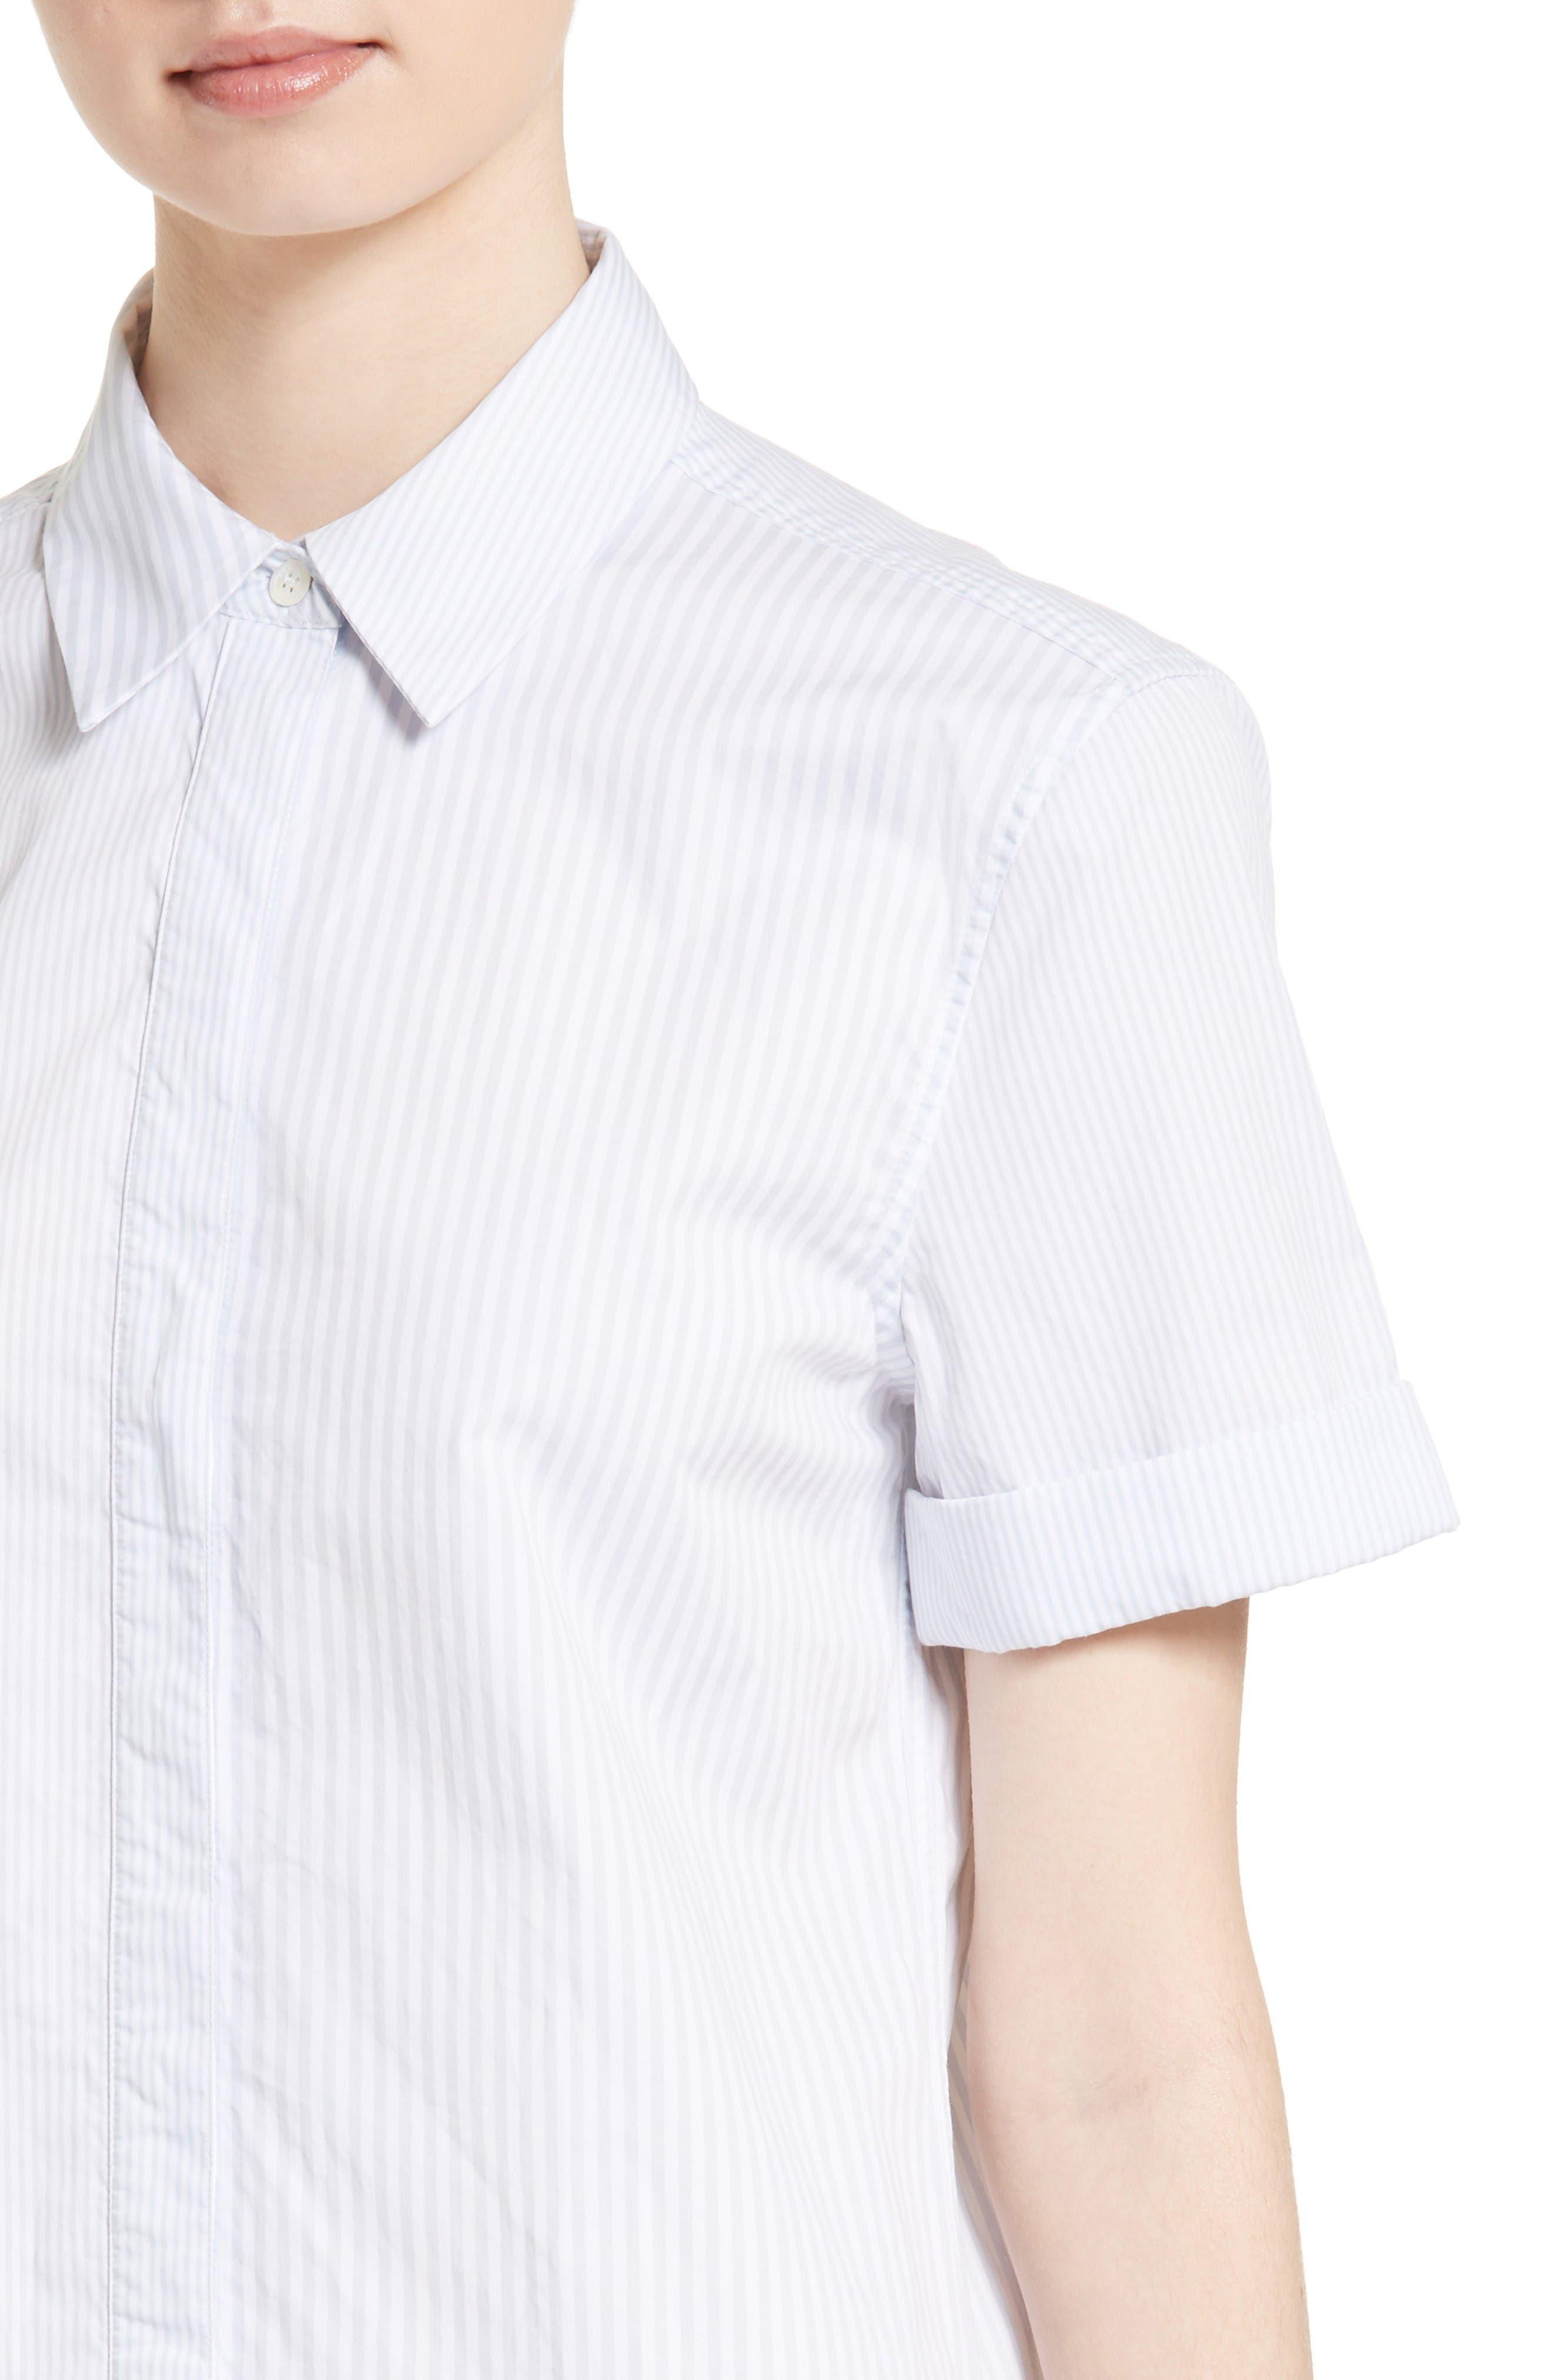 Mirelle Stripe Cotton Shirtdress,                             Alternate thumbnail 4, color,                             Bt Wht-Bri